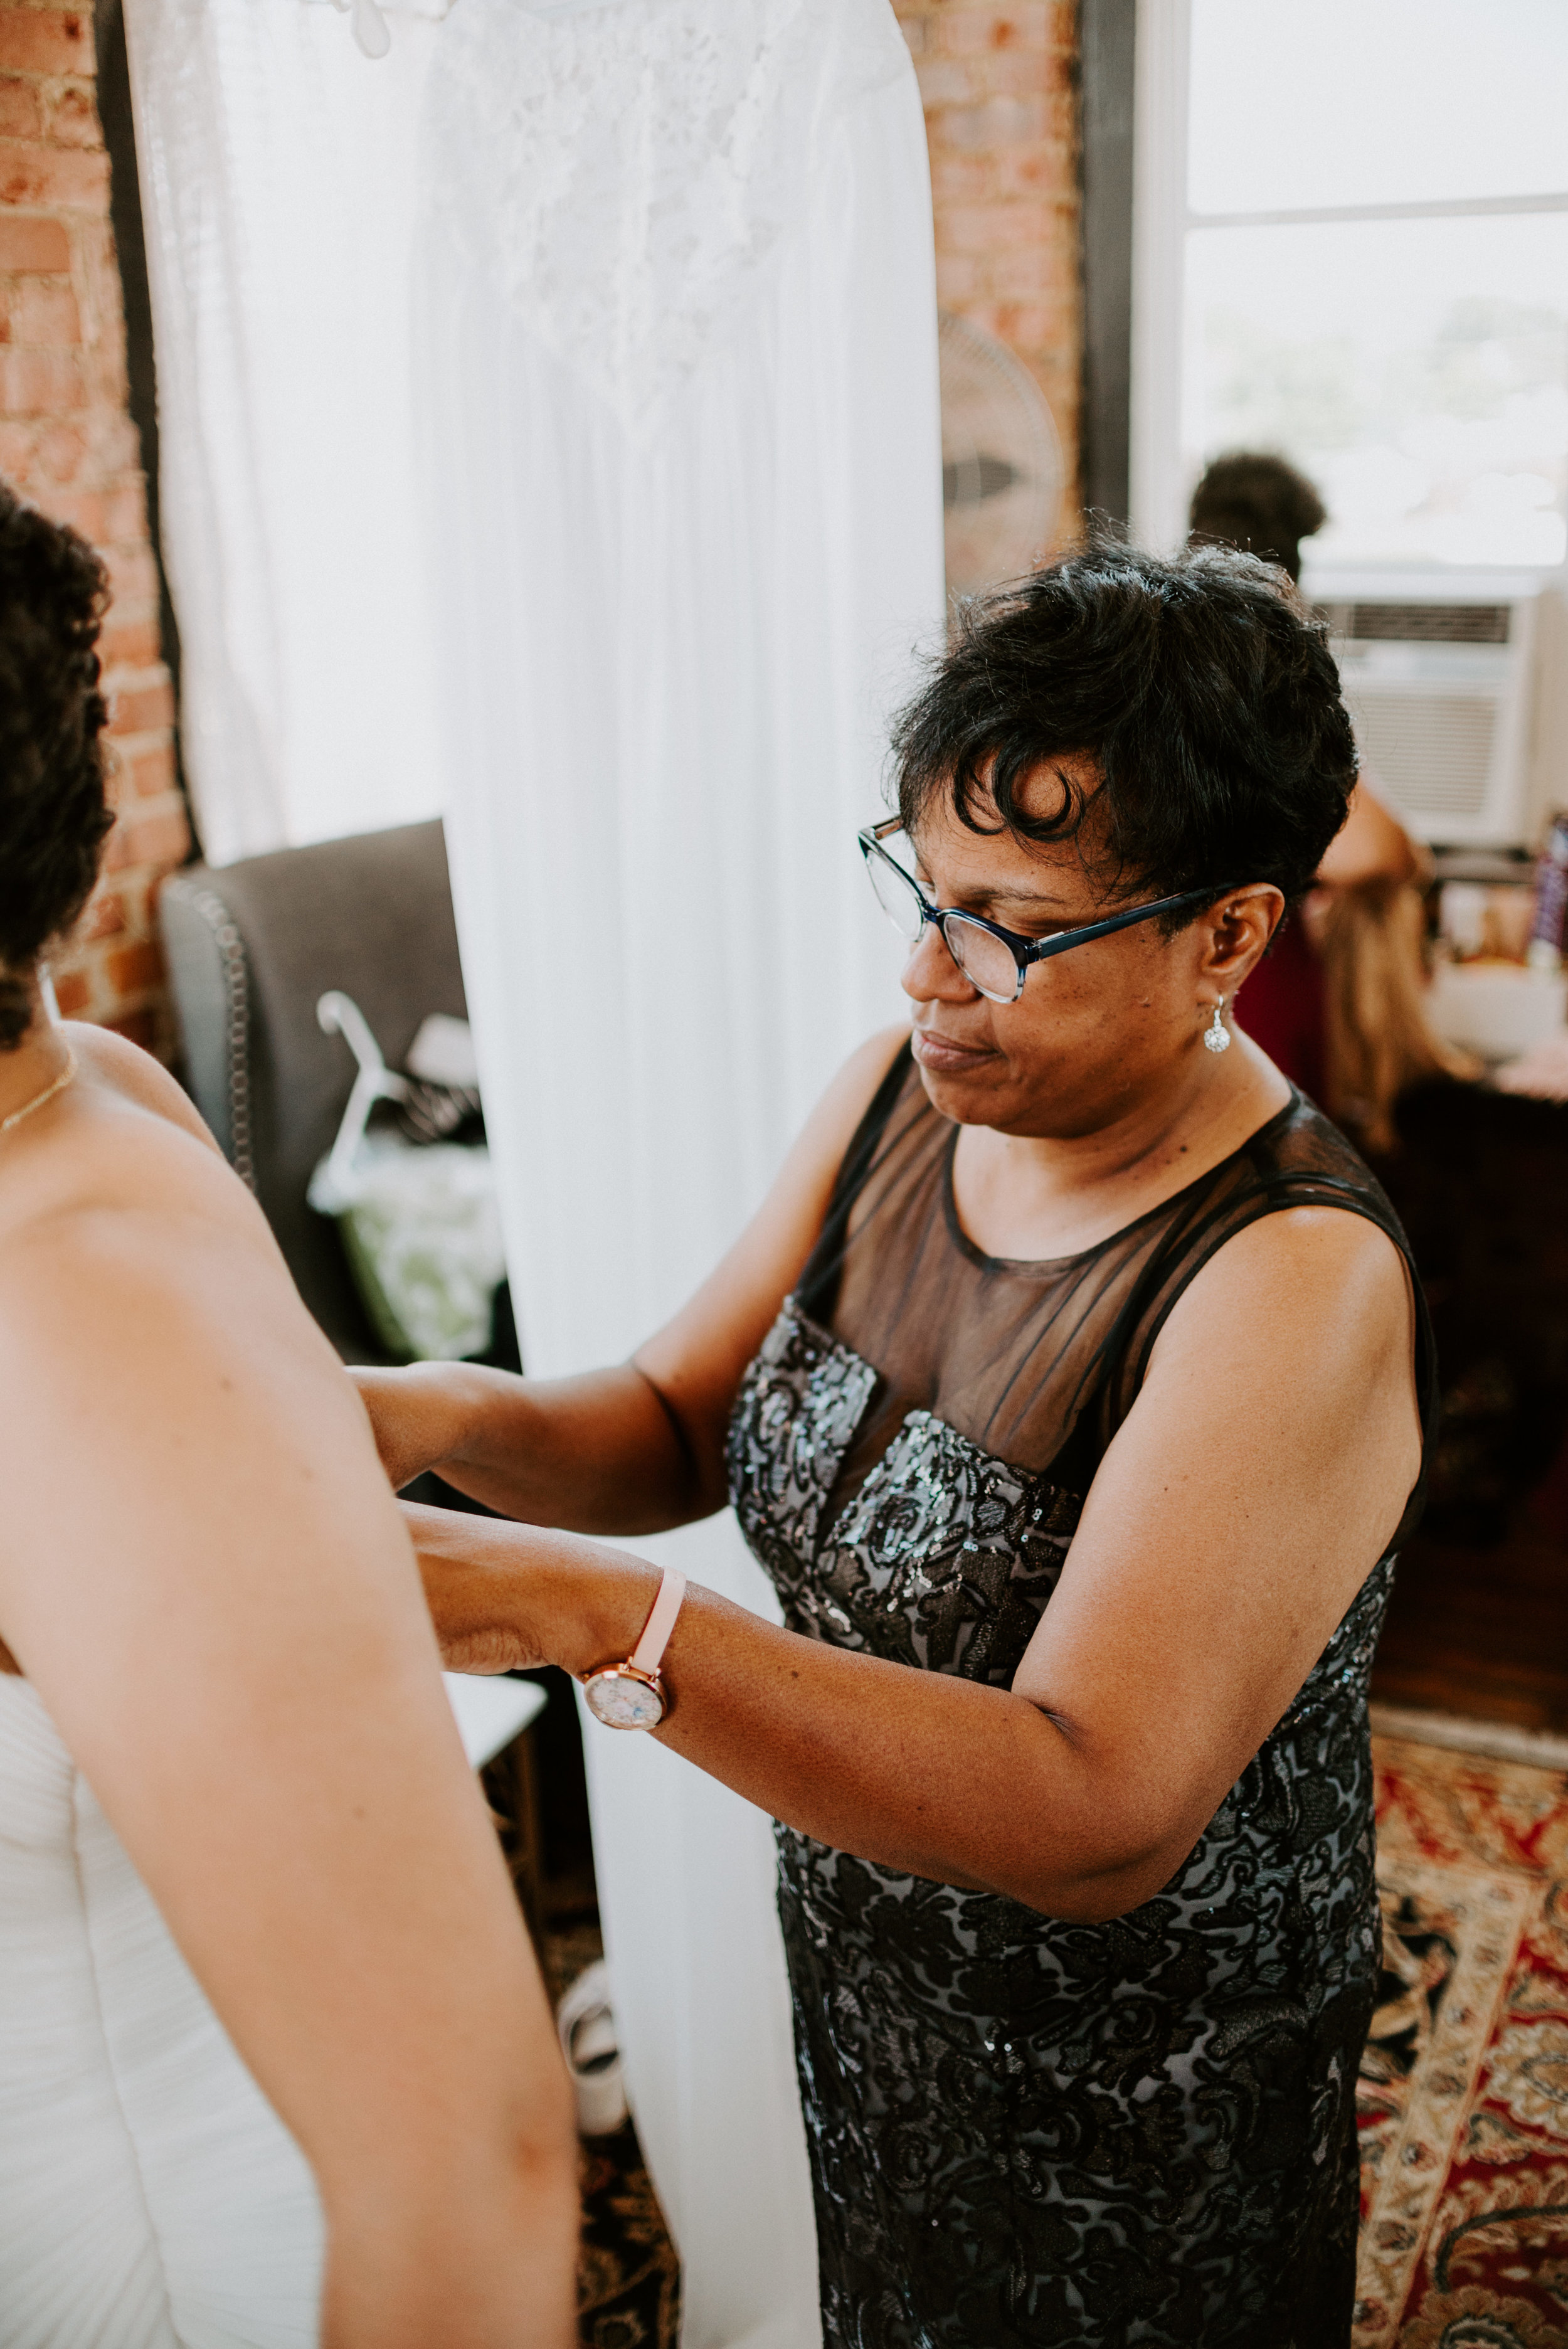 WonderlyCreative_Wedding_6.7.18_Khara&Dwayne_-107.jpg